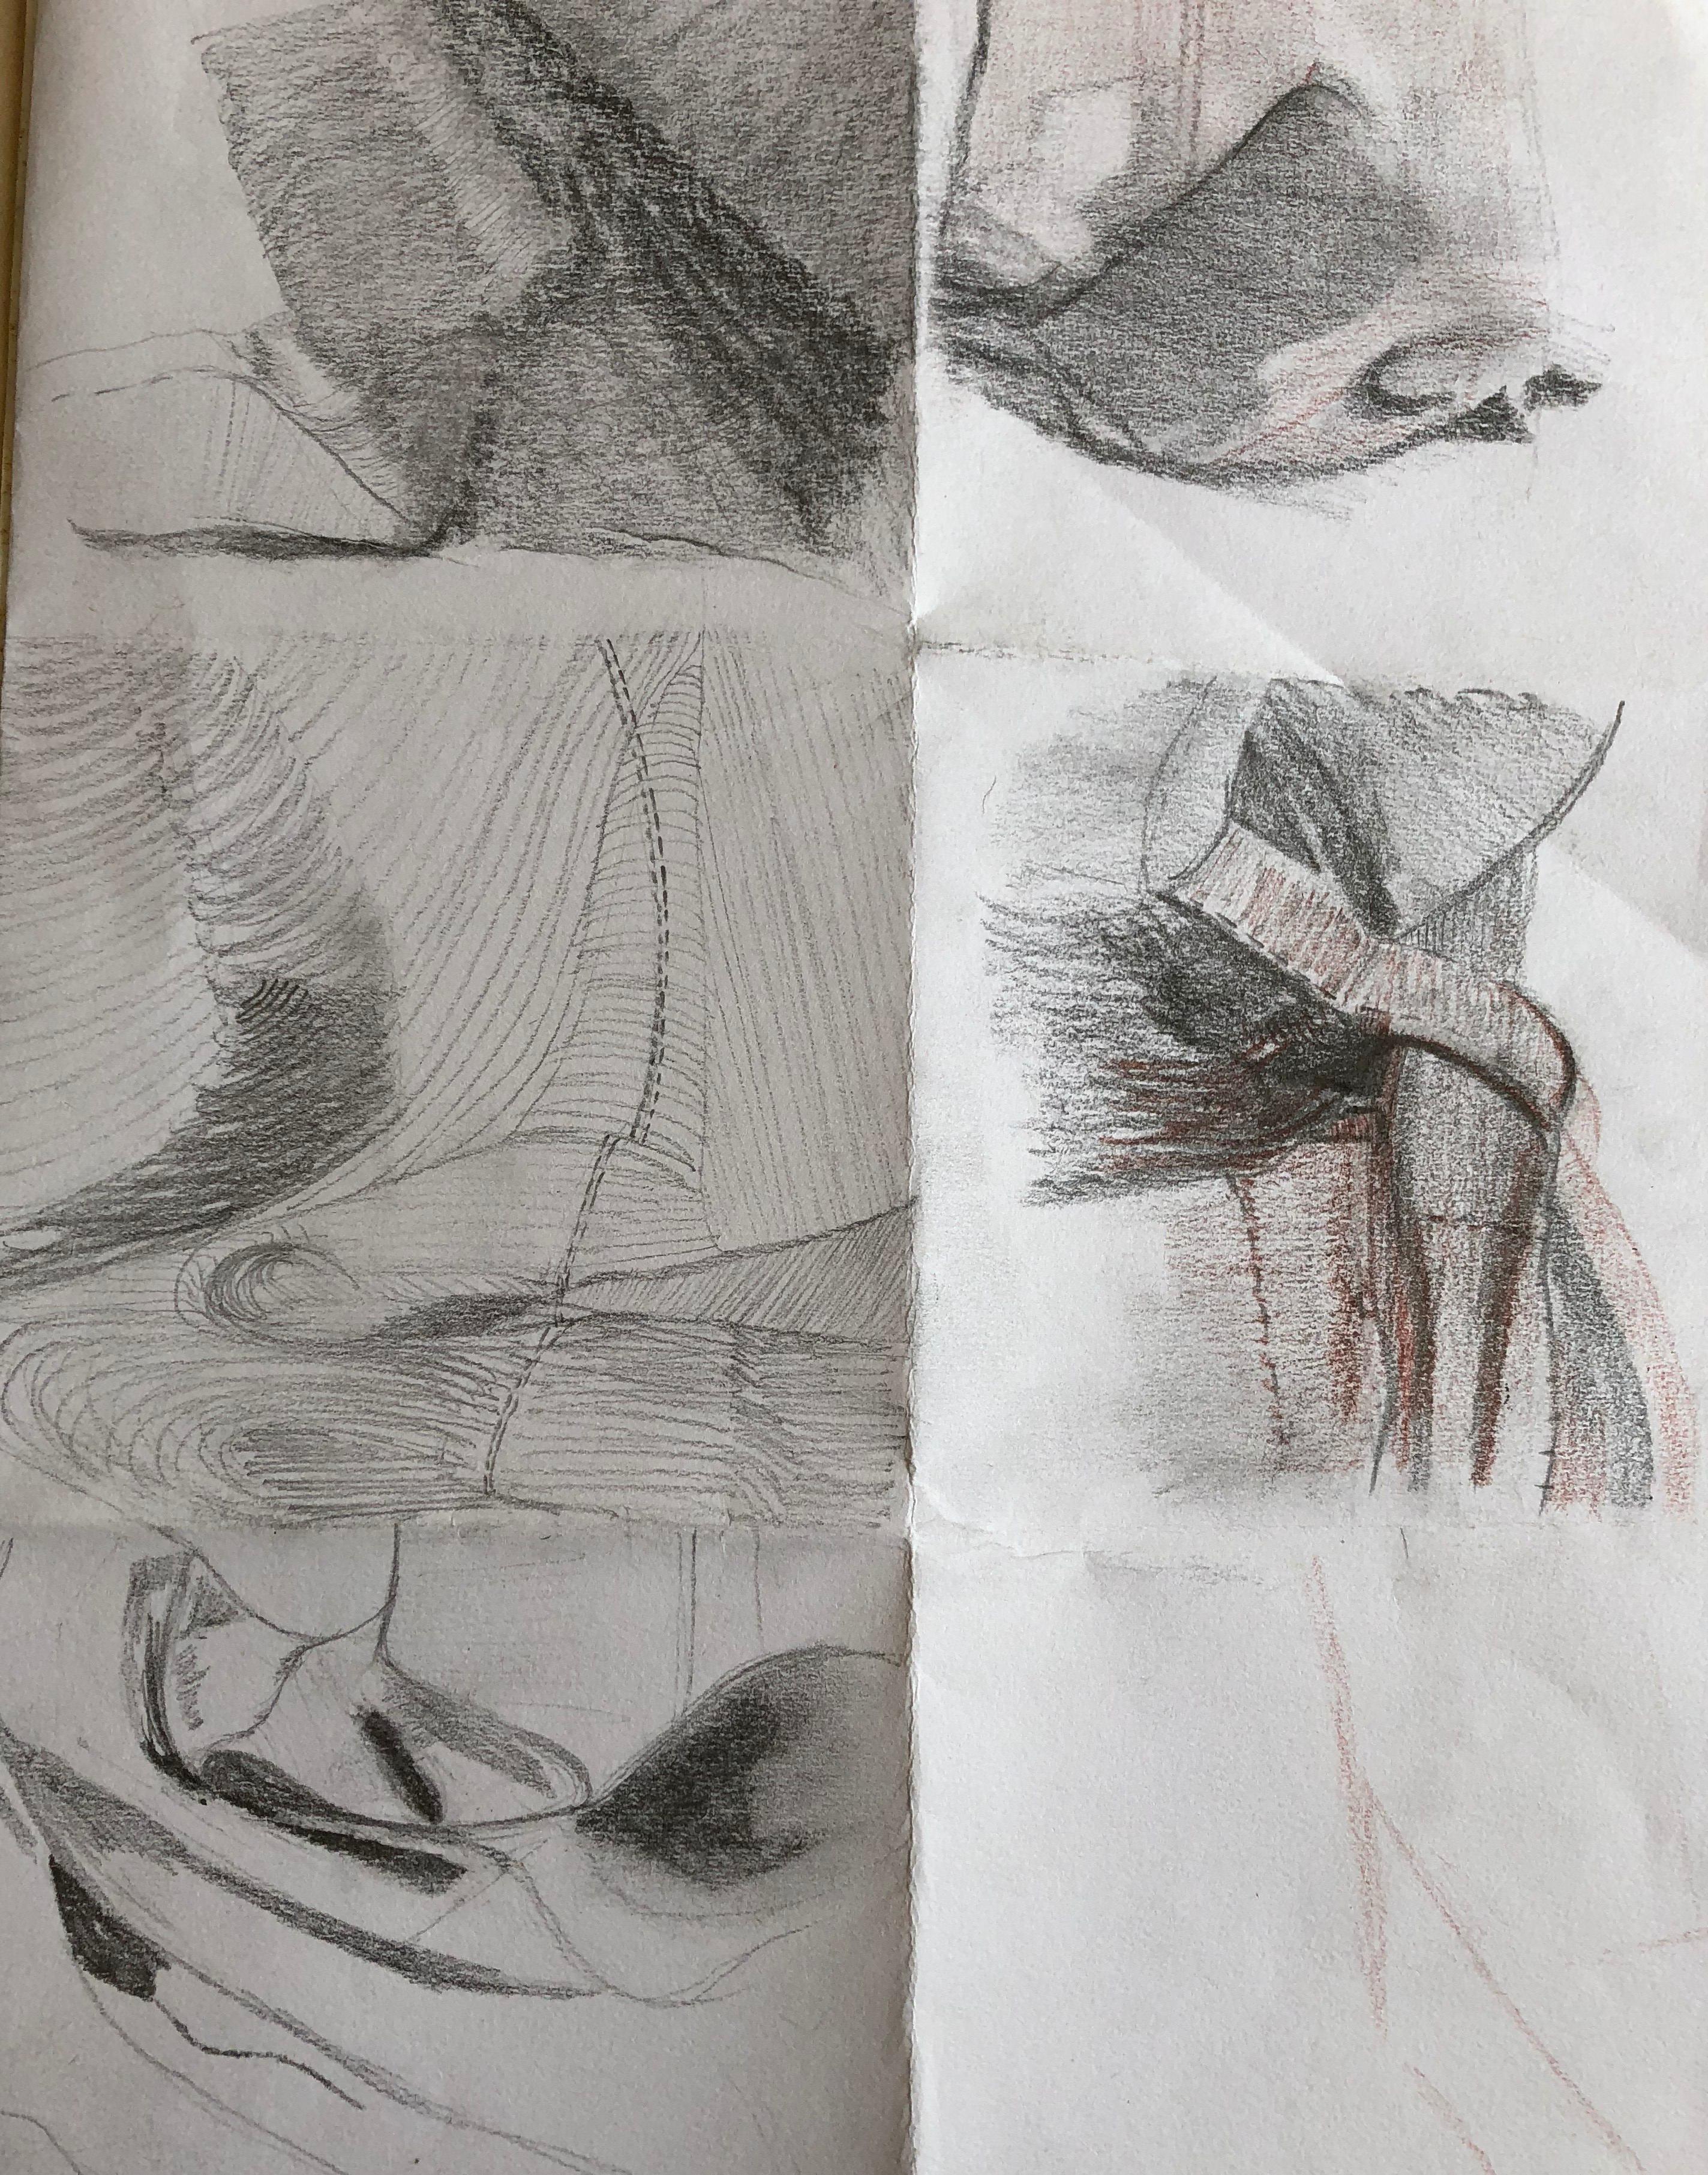 drape-parts-sketches.jpg